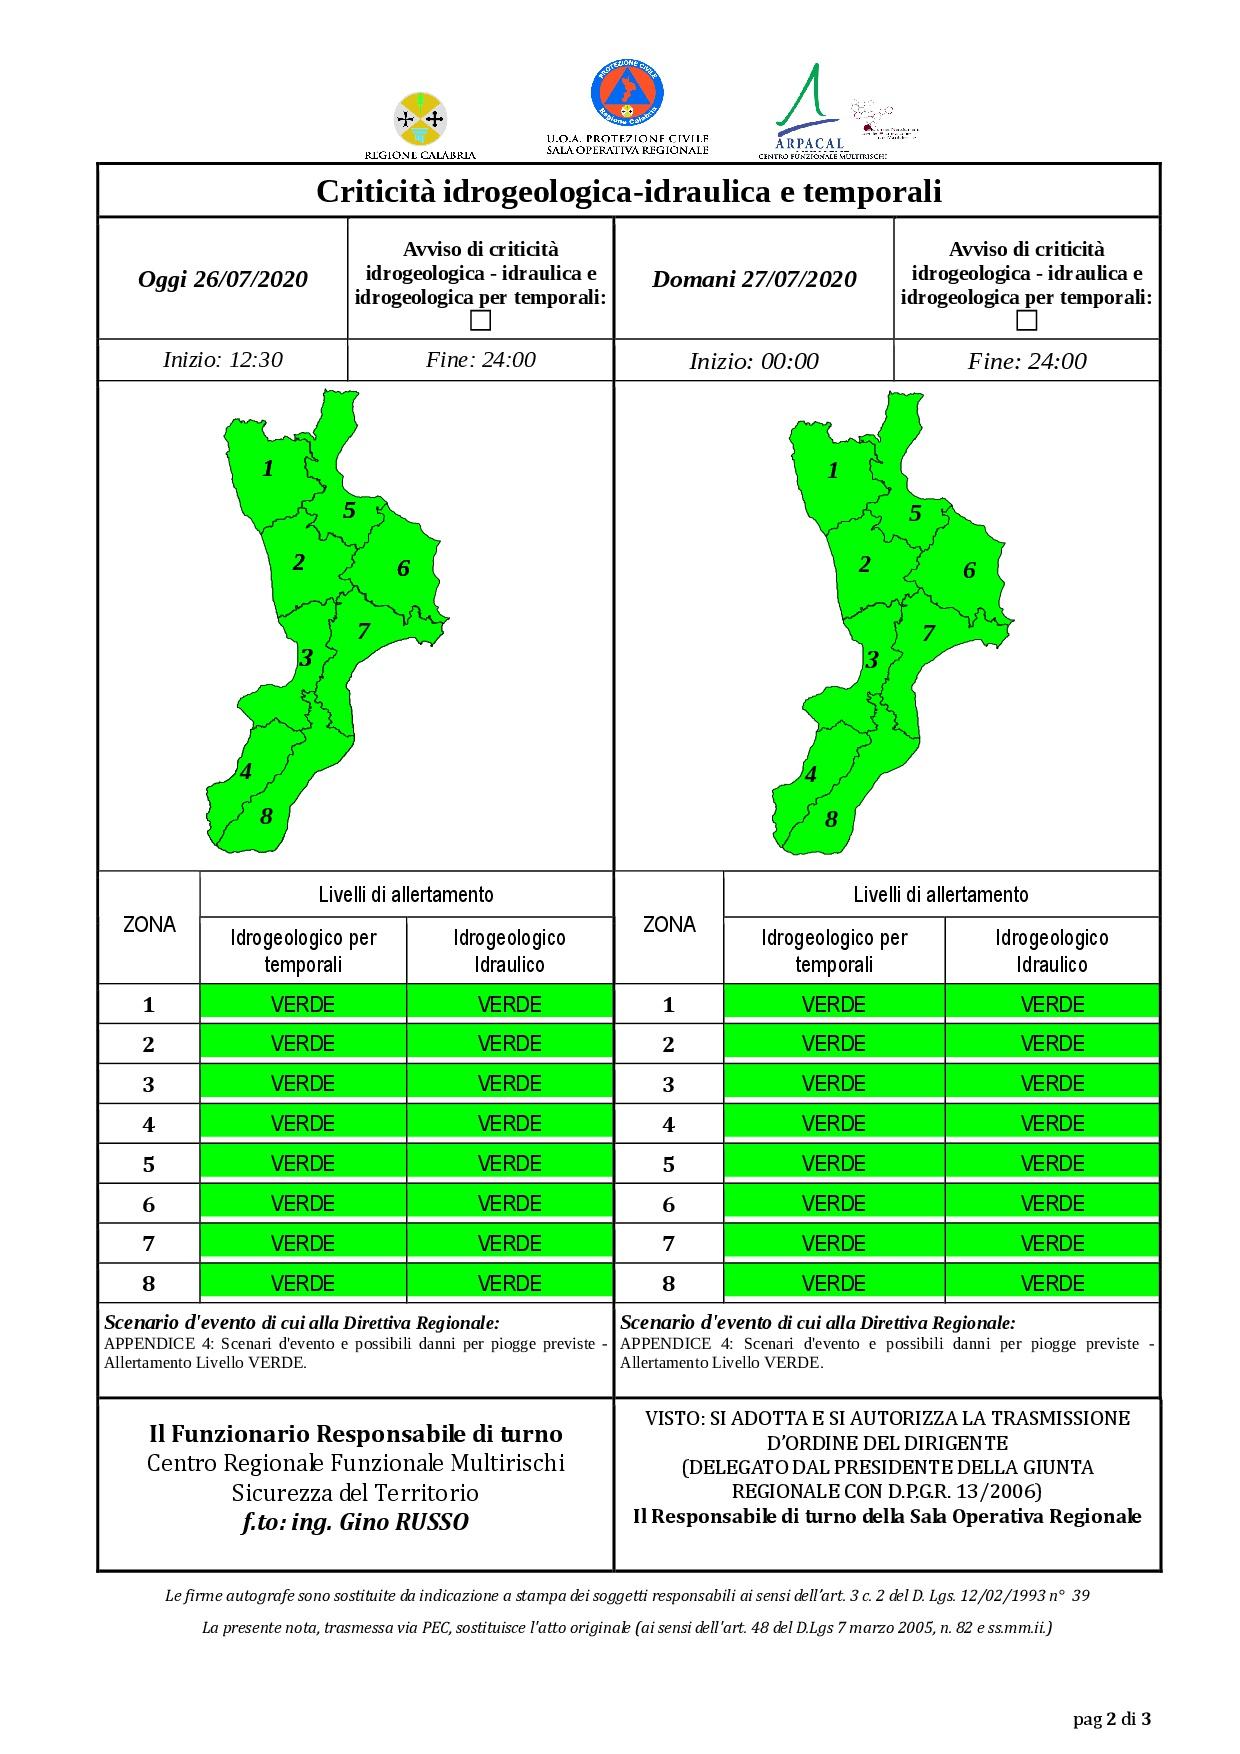 Criticità idrogeologica-idraulica e temporali in Calabria 26-07-2020